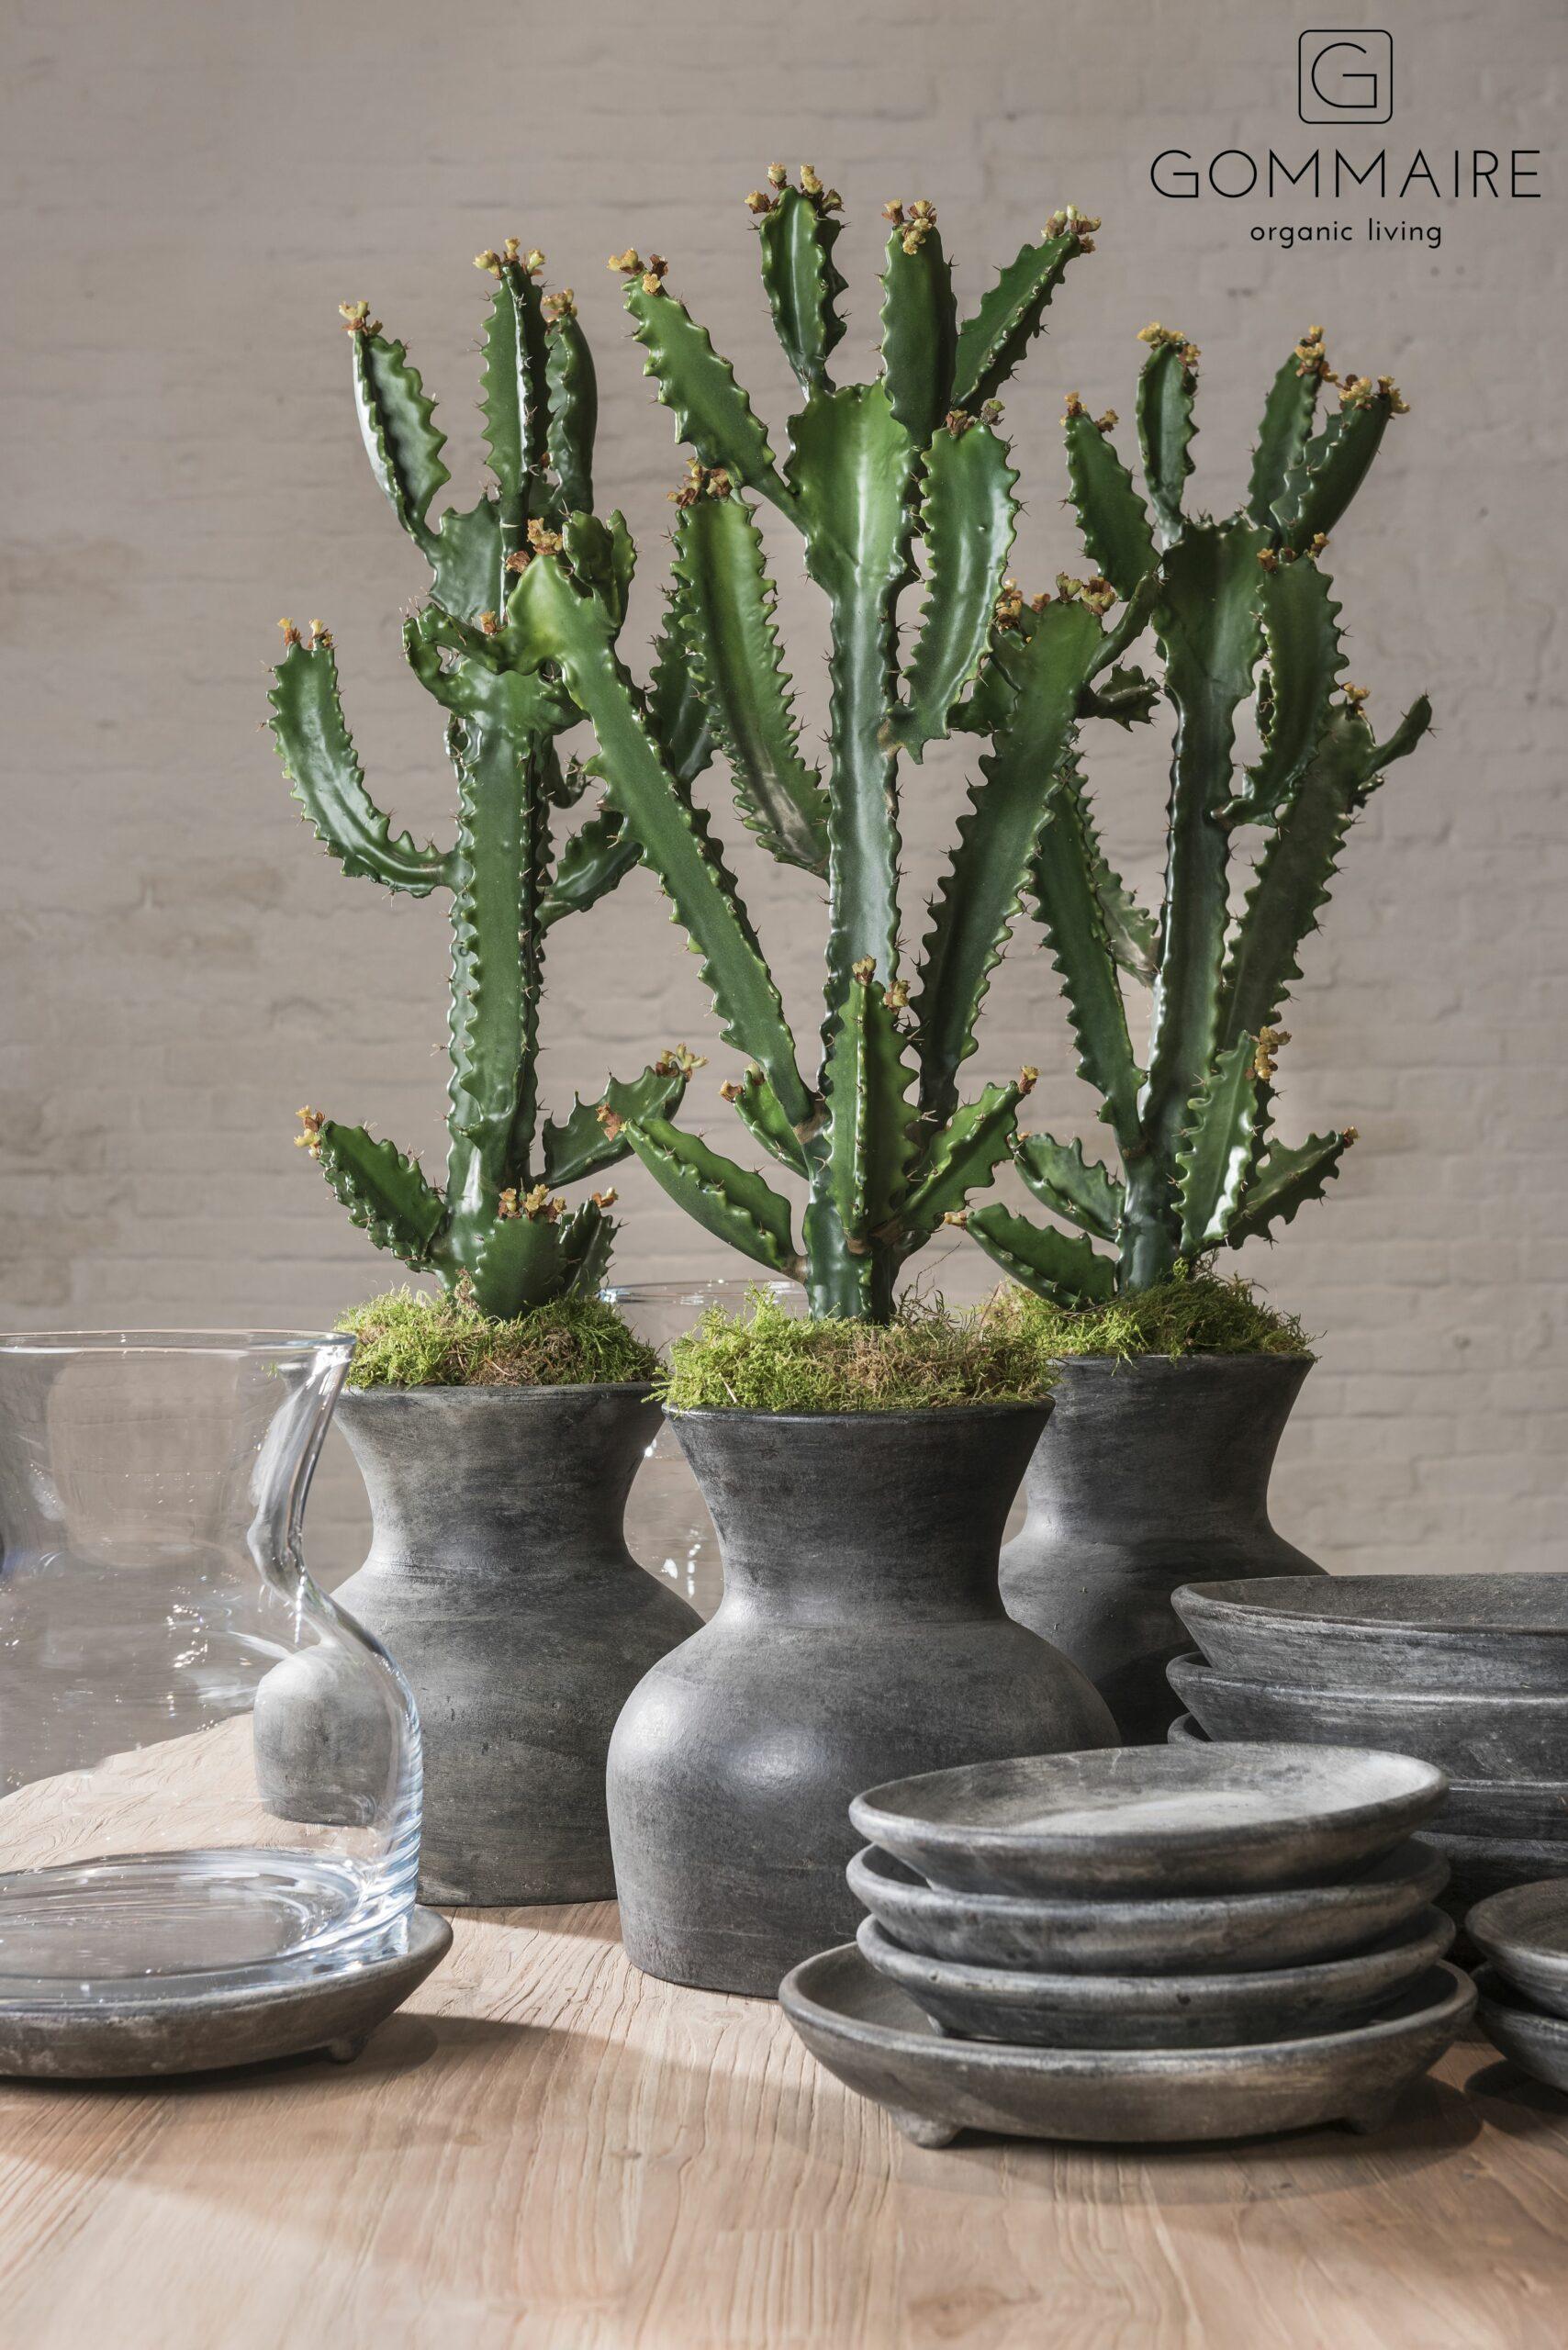 Gommaire-decoration-terracotta-accessories-vase_candice